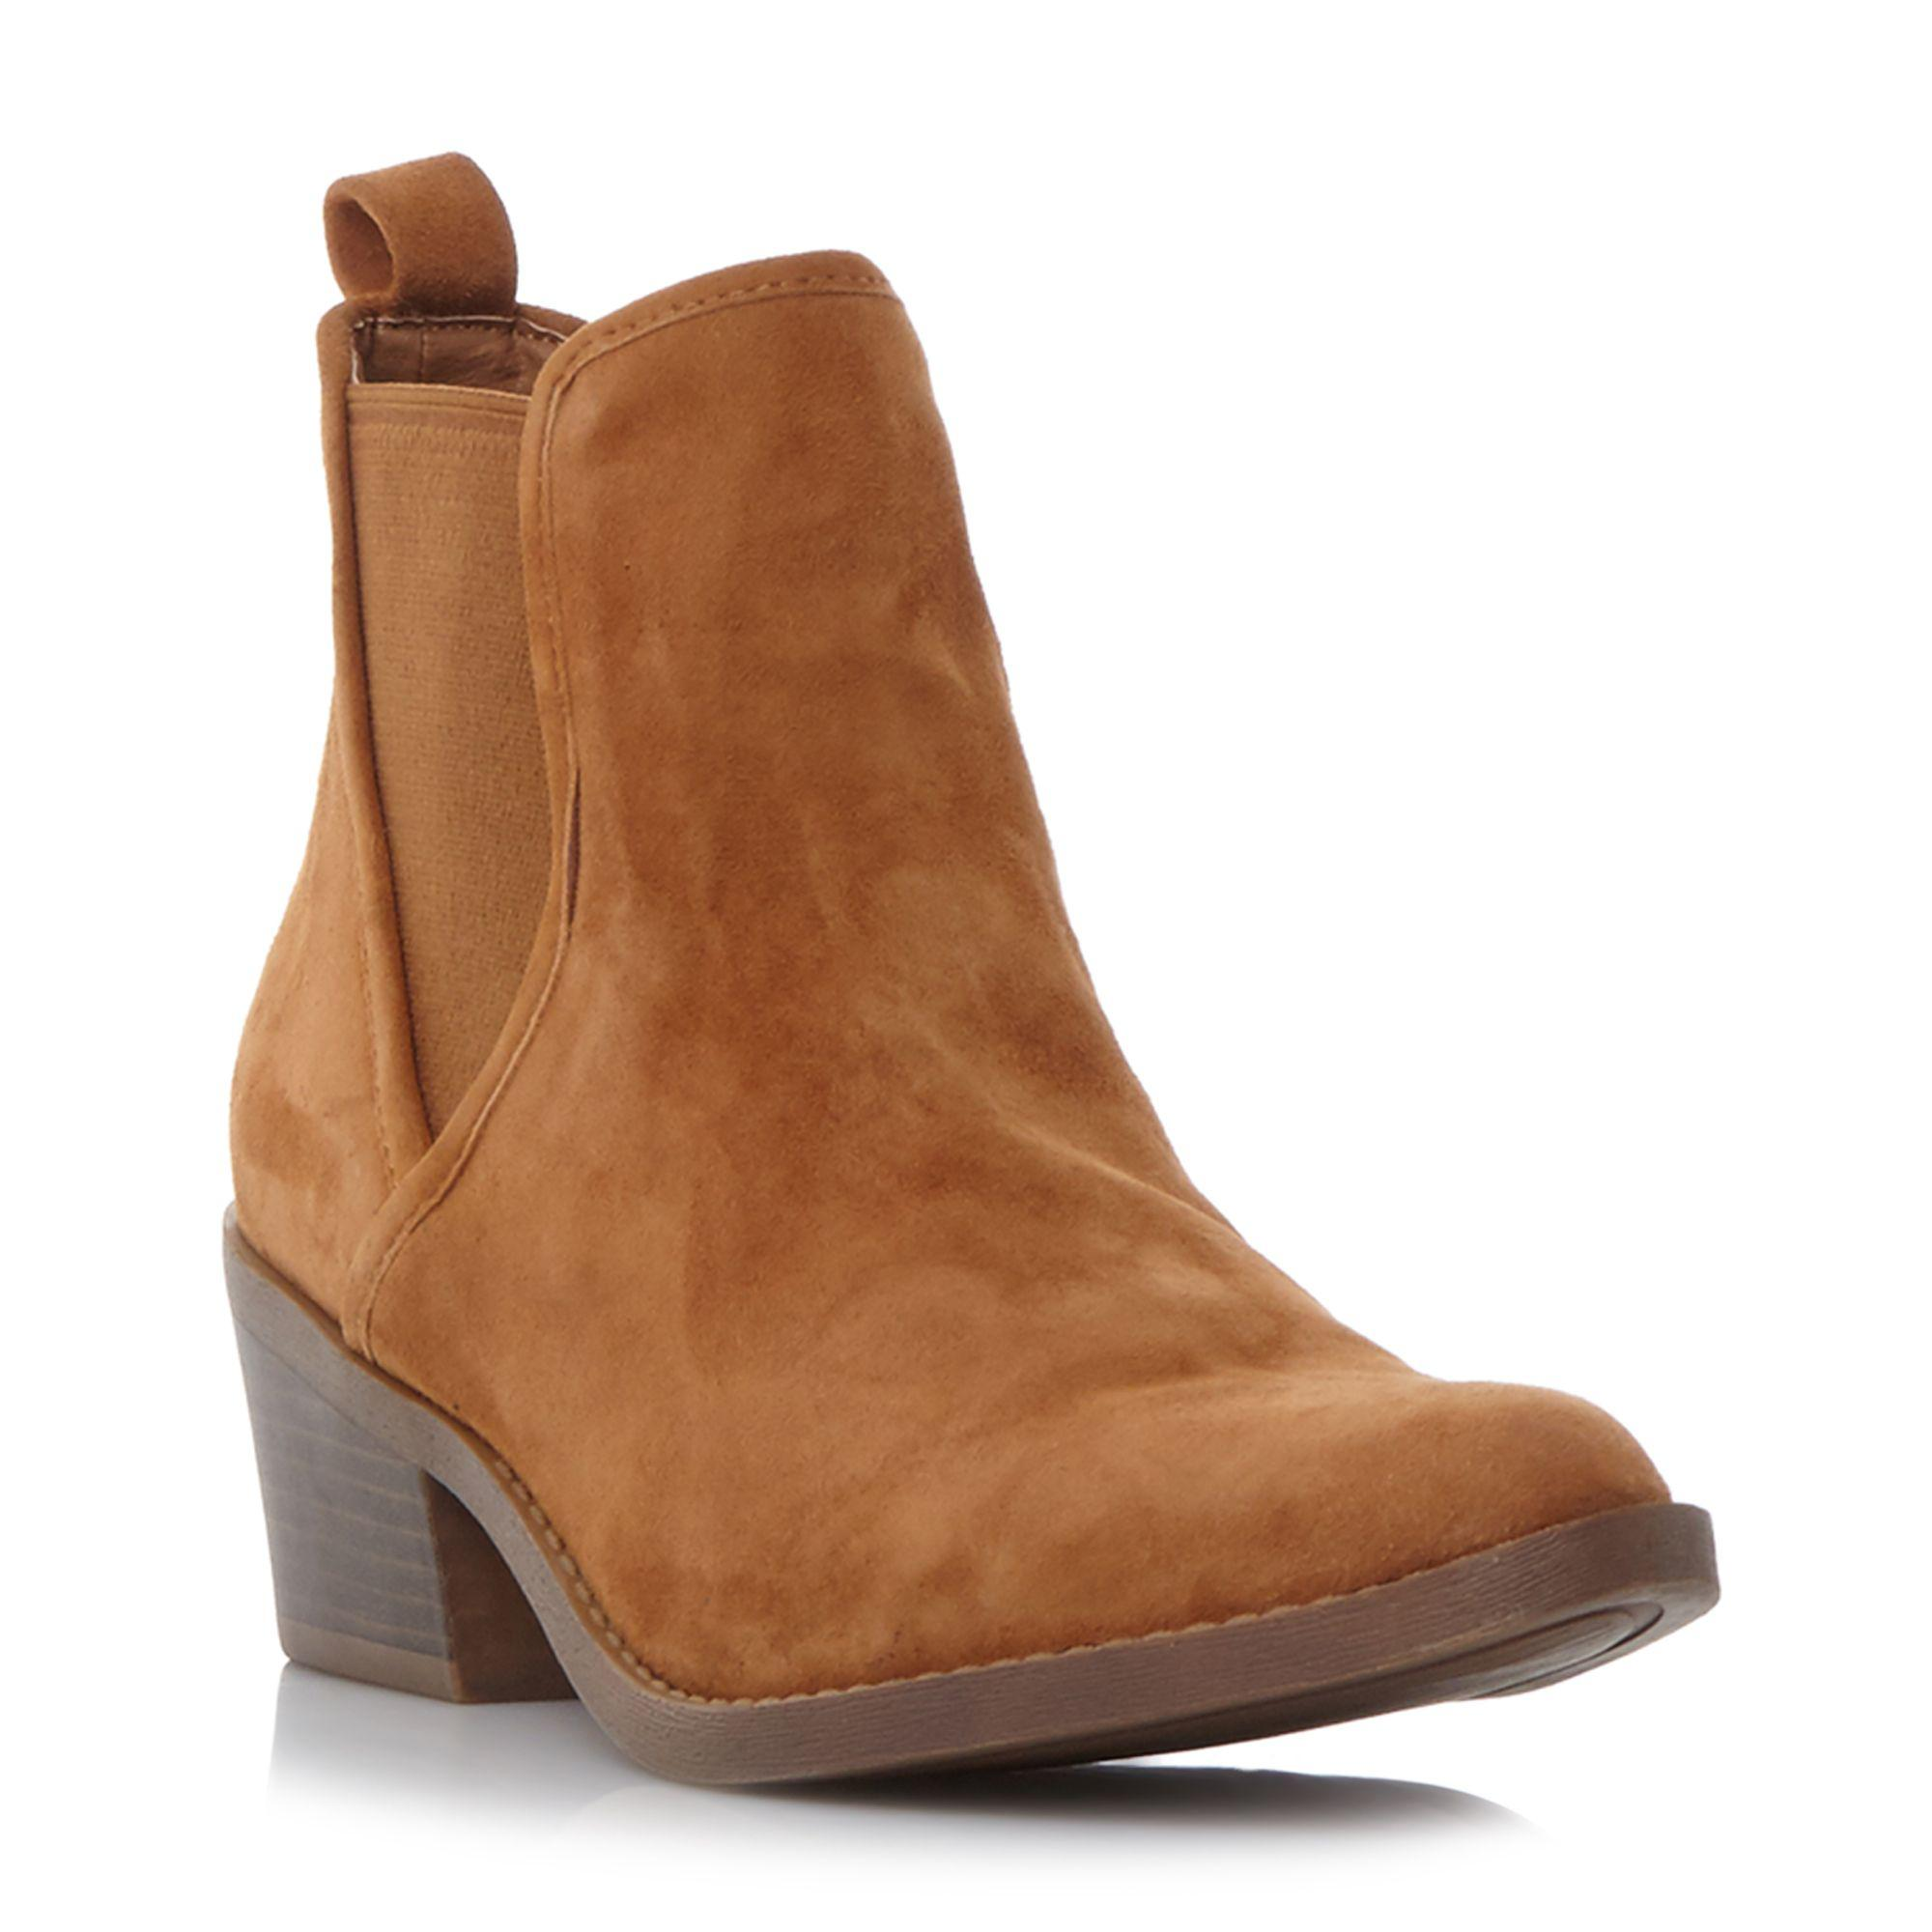 81e1c205b31 Steve Madden Tan Suedetalor Mid Block Heel Ankle Boots in Brown - Lyst